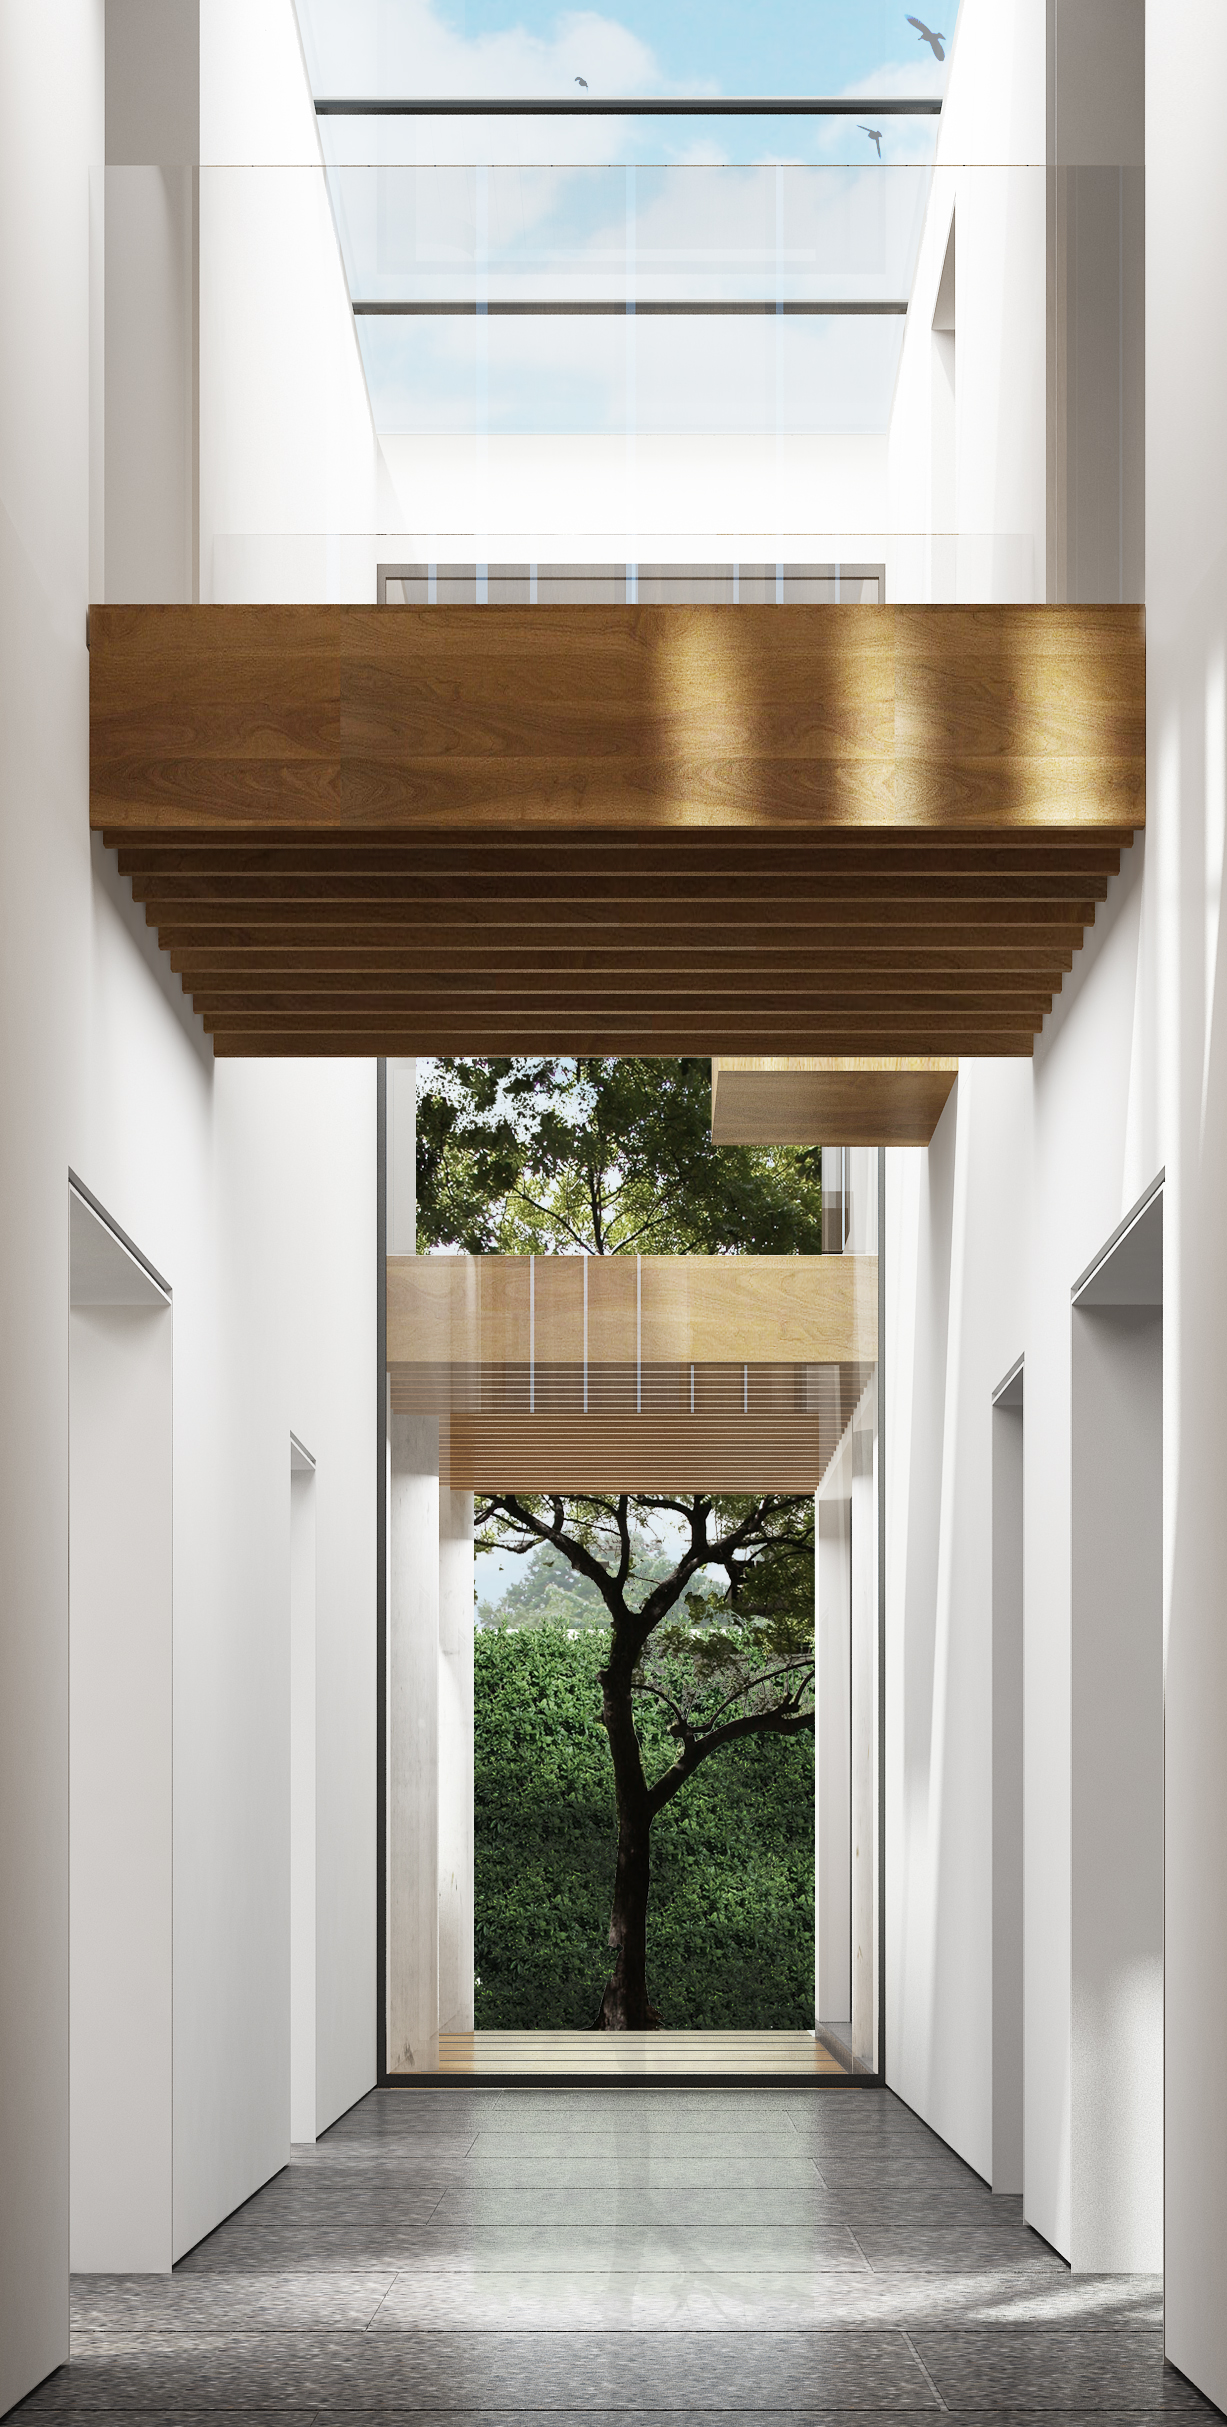 01 Foyer entrance